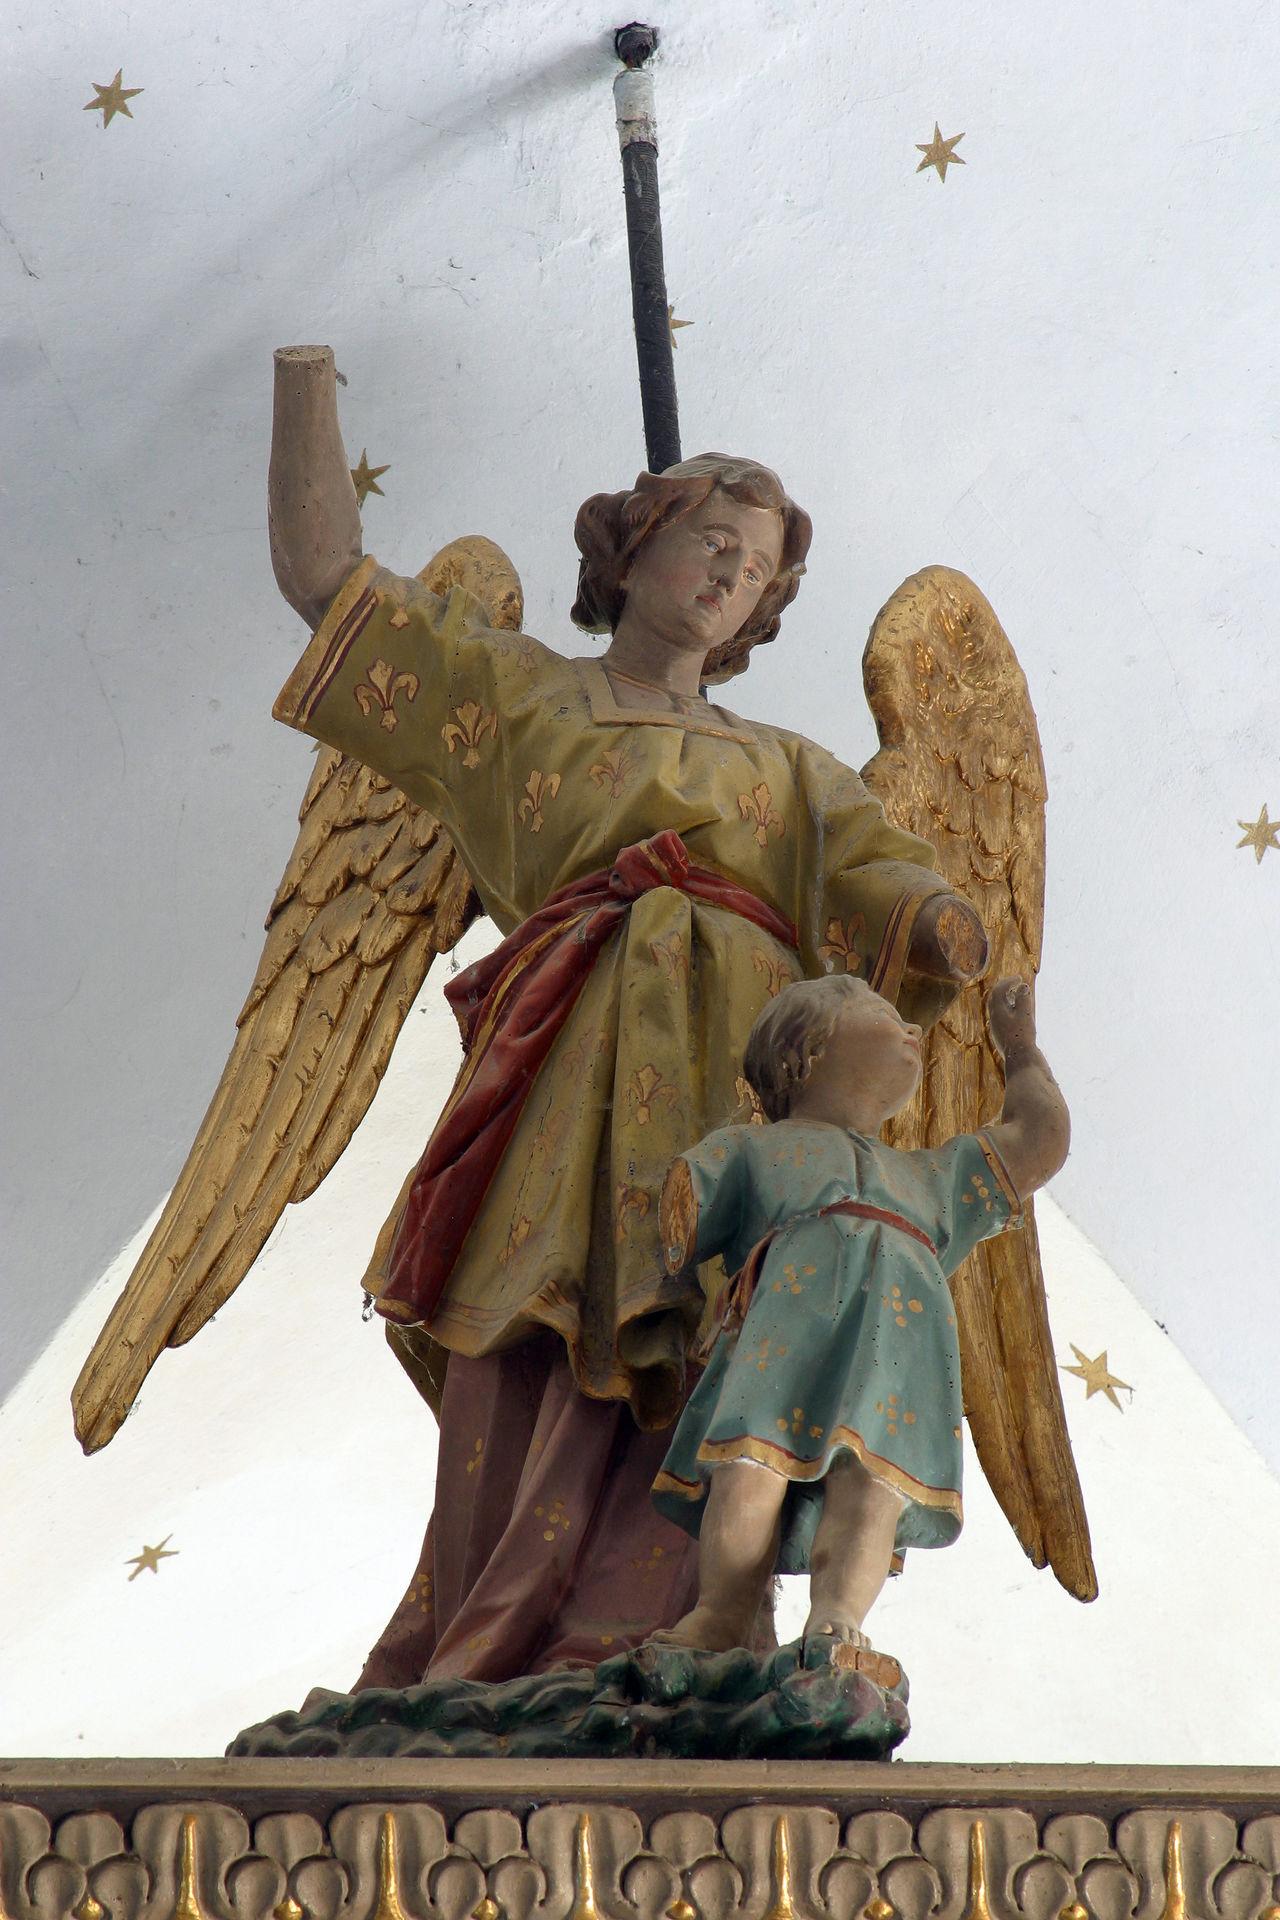 Angel guardian Altar Angel Antique Art Belief Christianity .. Church Confession Croatia Europe Faith Gold Gospel Guardian Historical Holy Old Pray Religion Religious  Saint Sculpture Spirituality Statue Worship